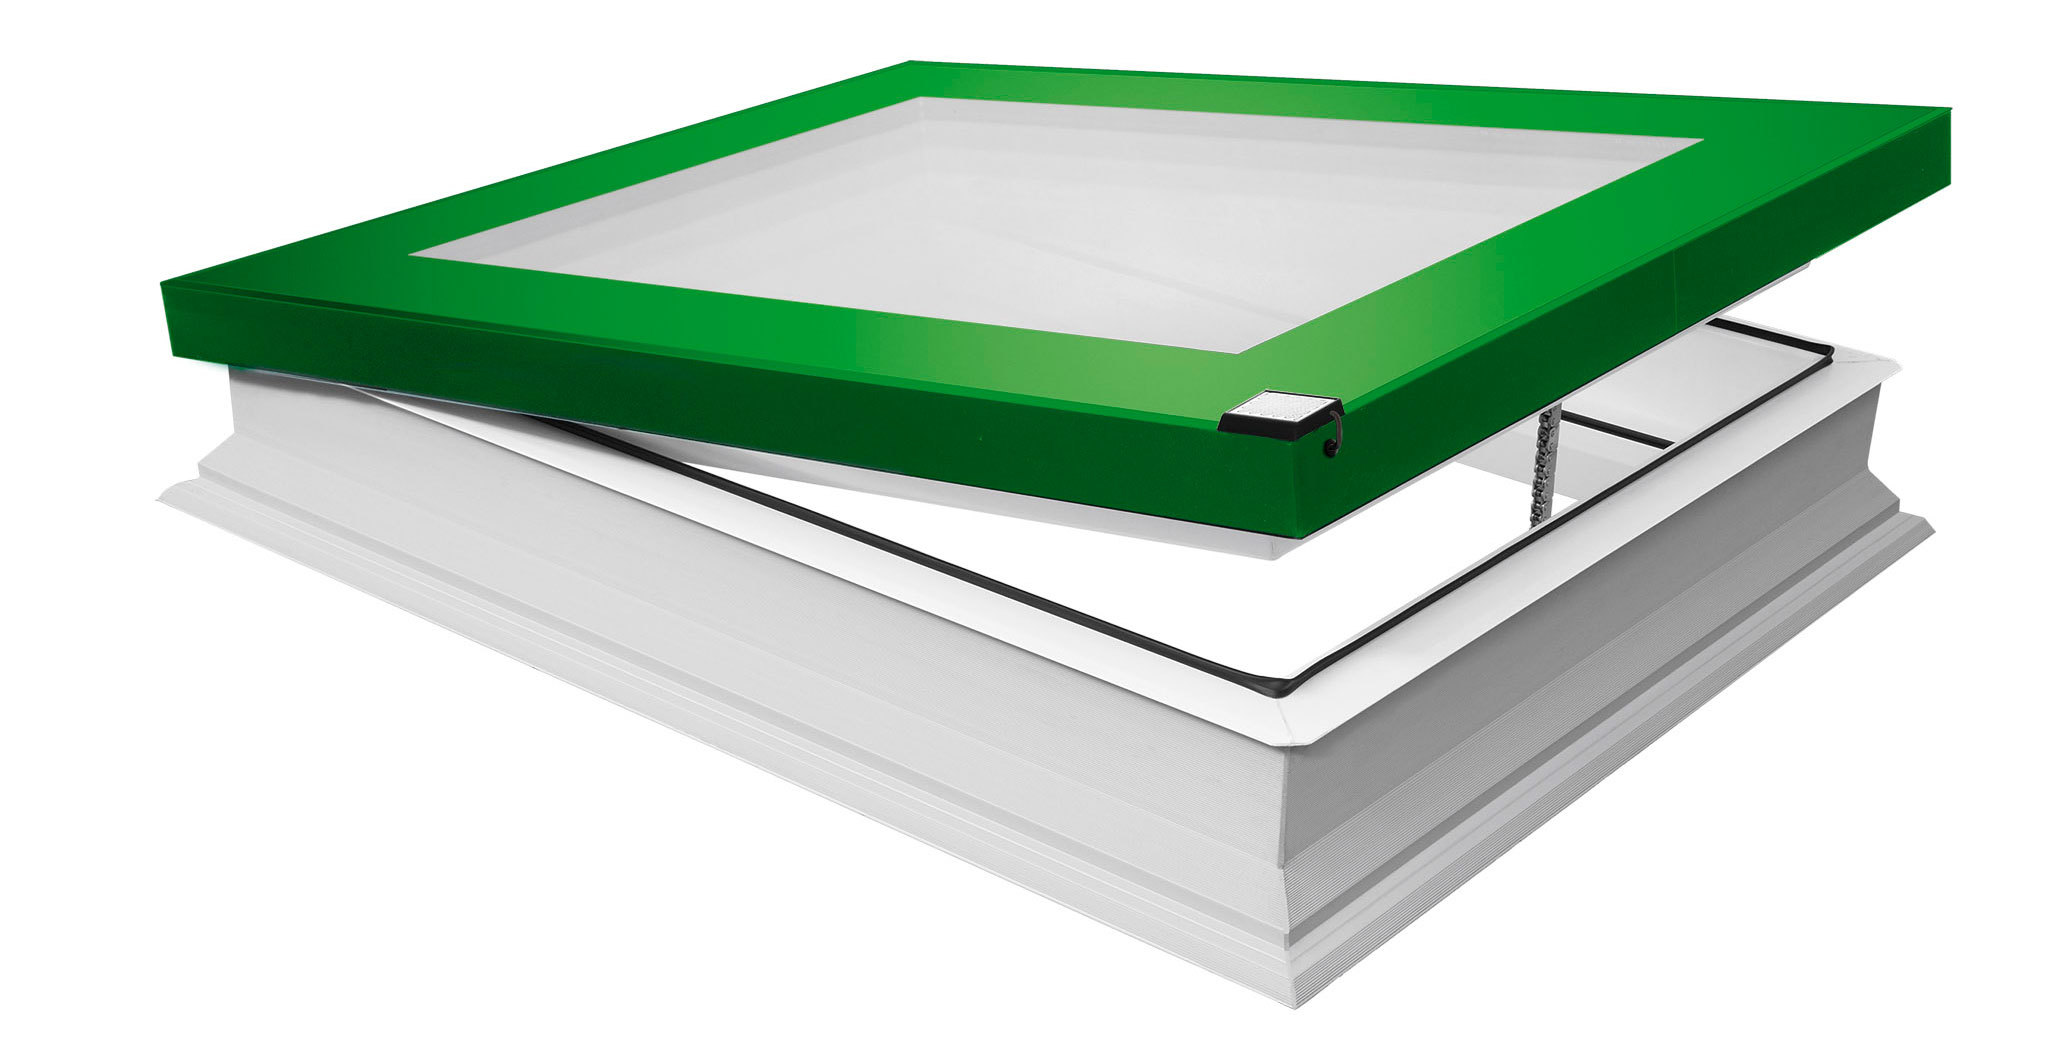 Green skylight